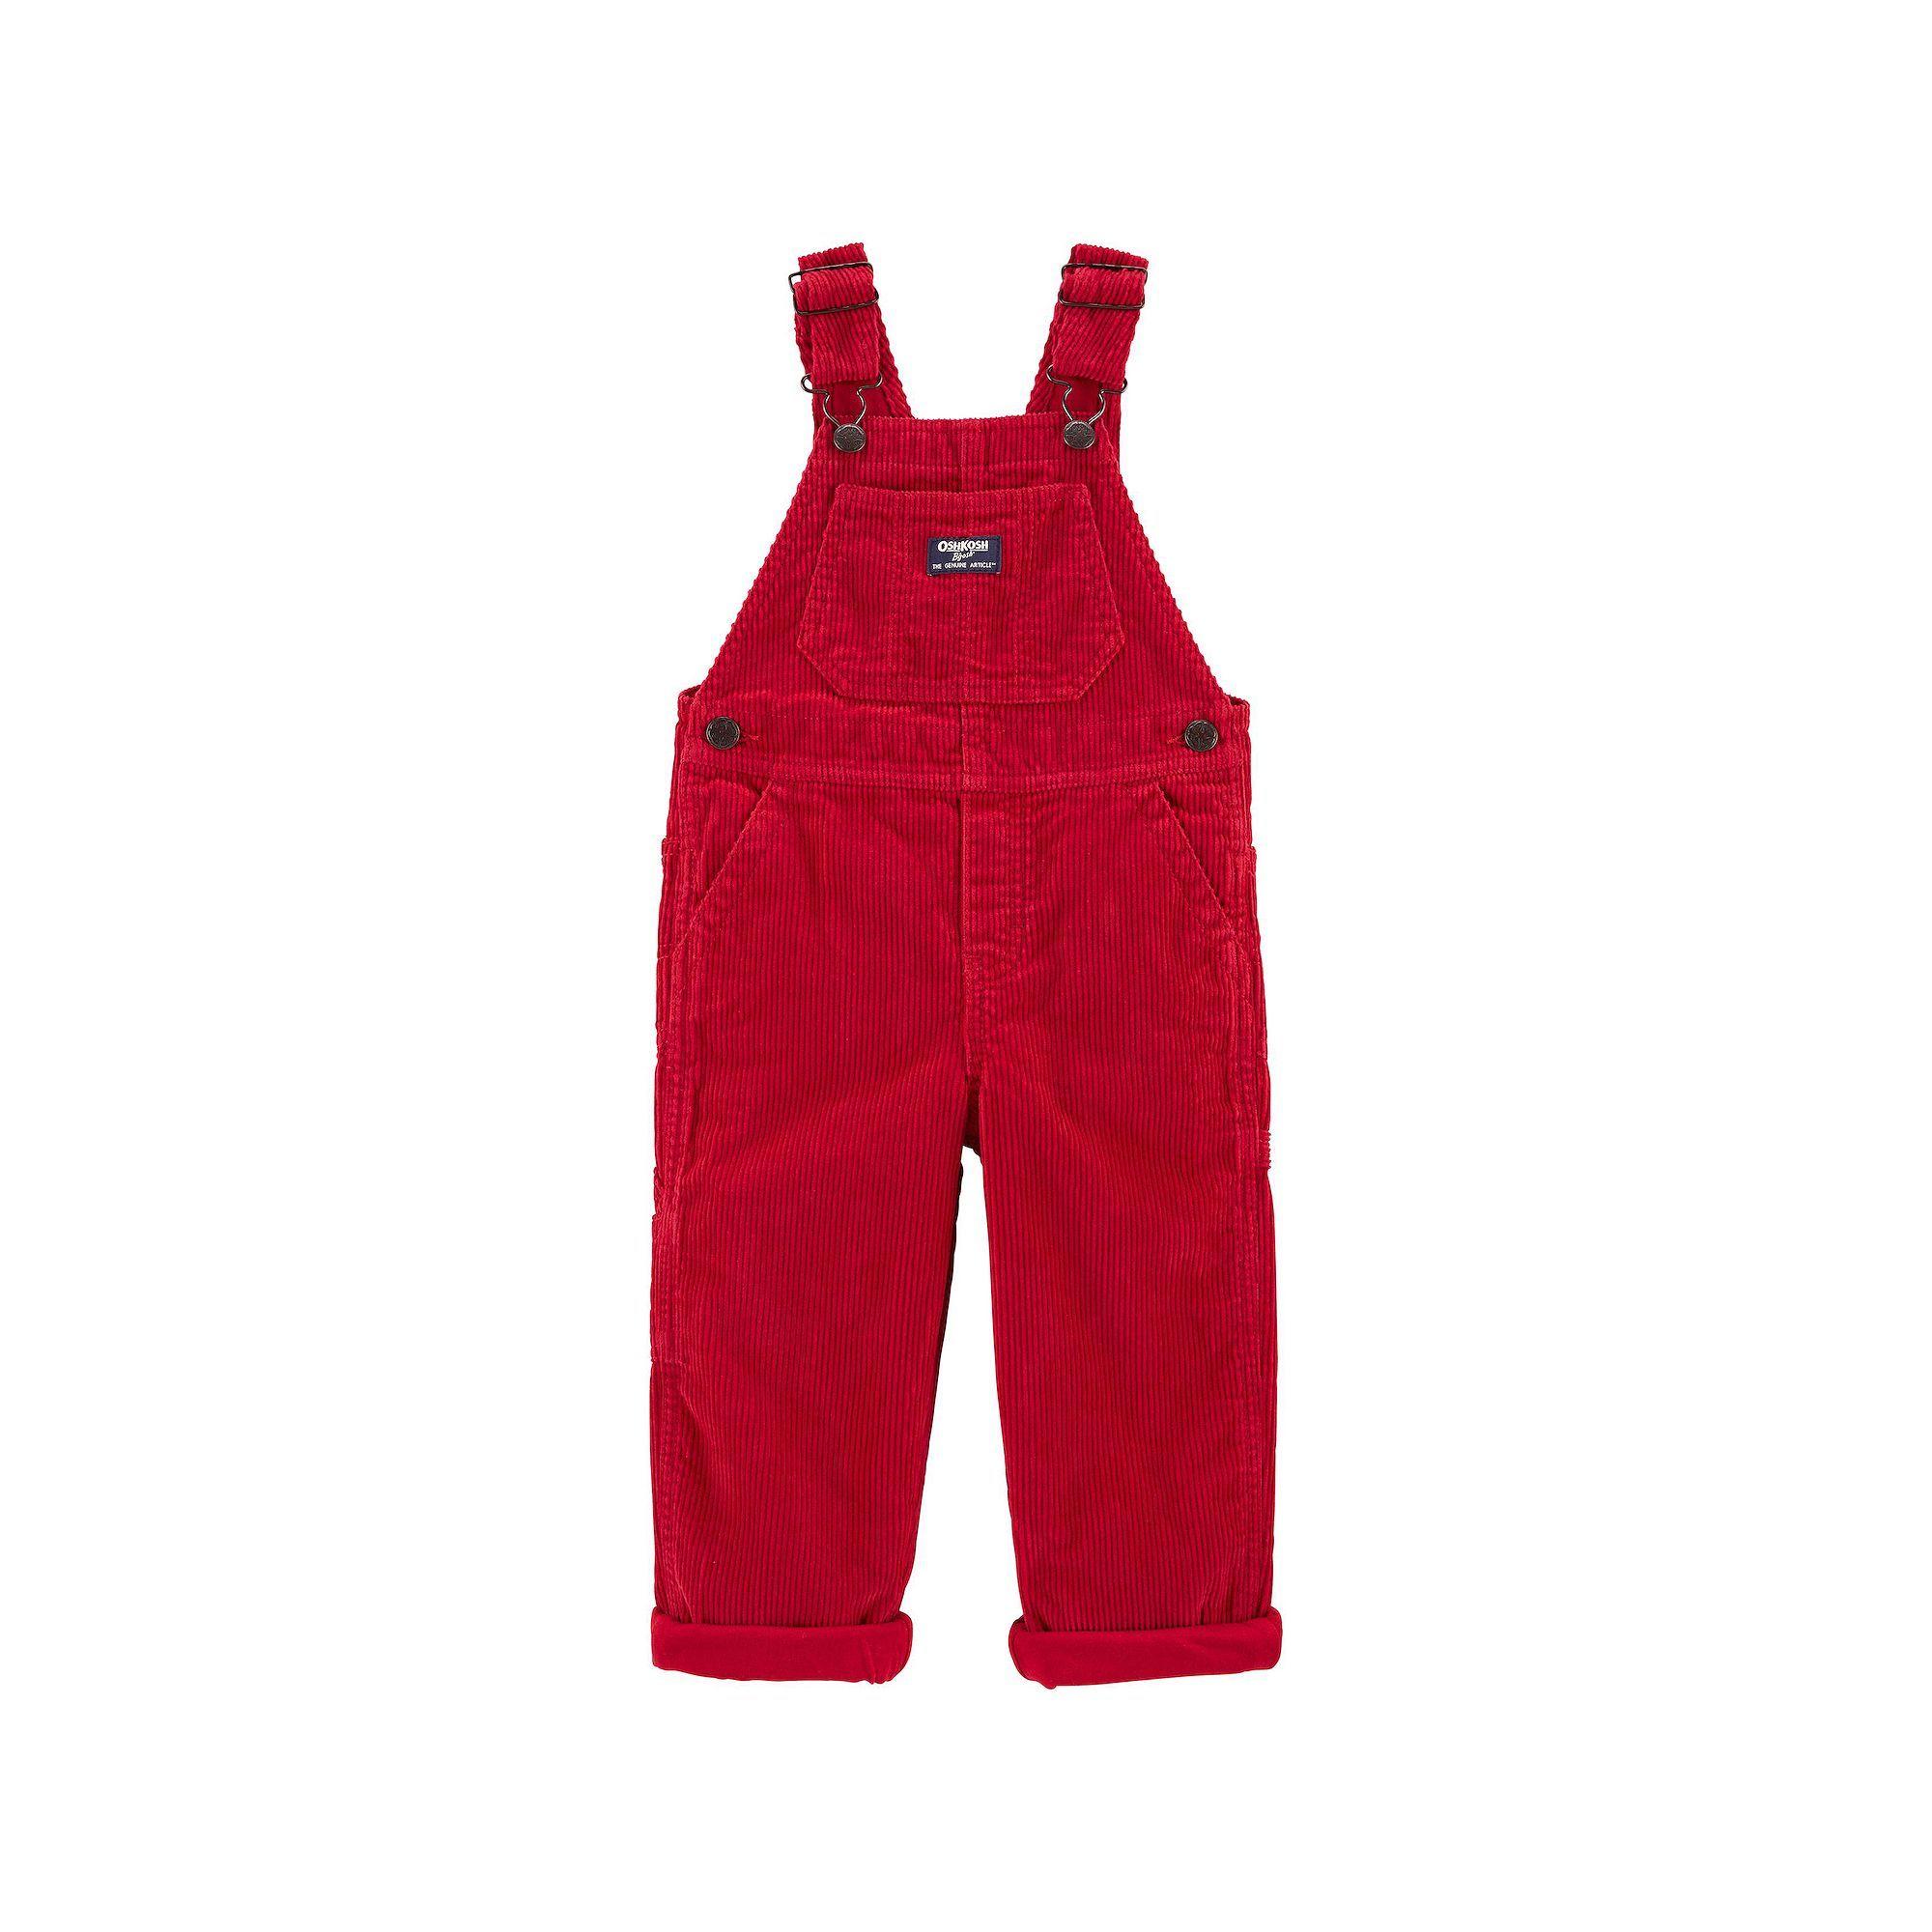 OshKosh B/'Gosh boy/'s lined overalls size 2T